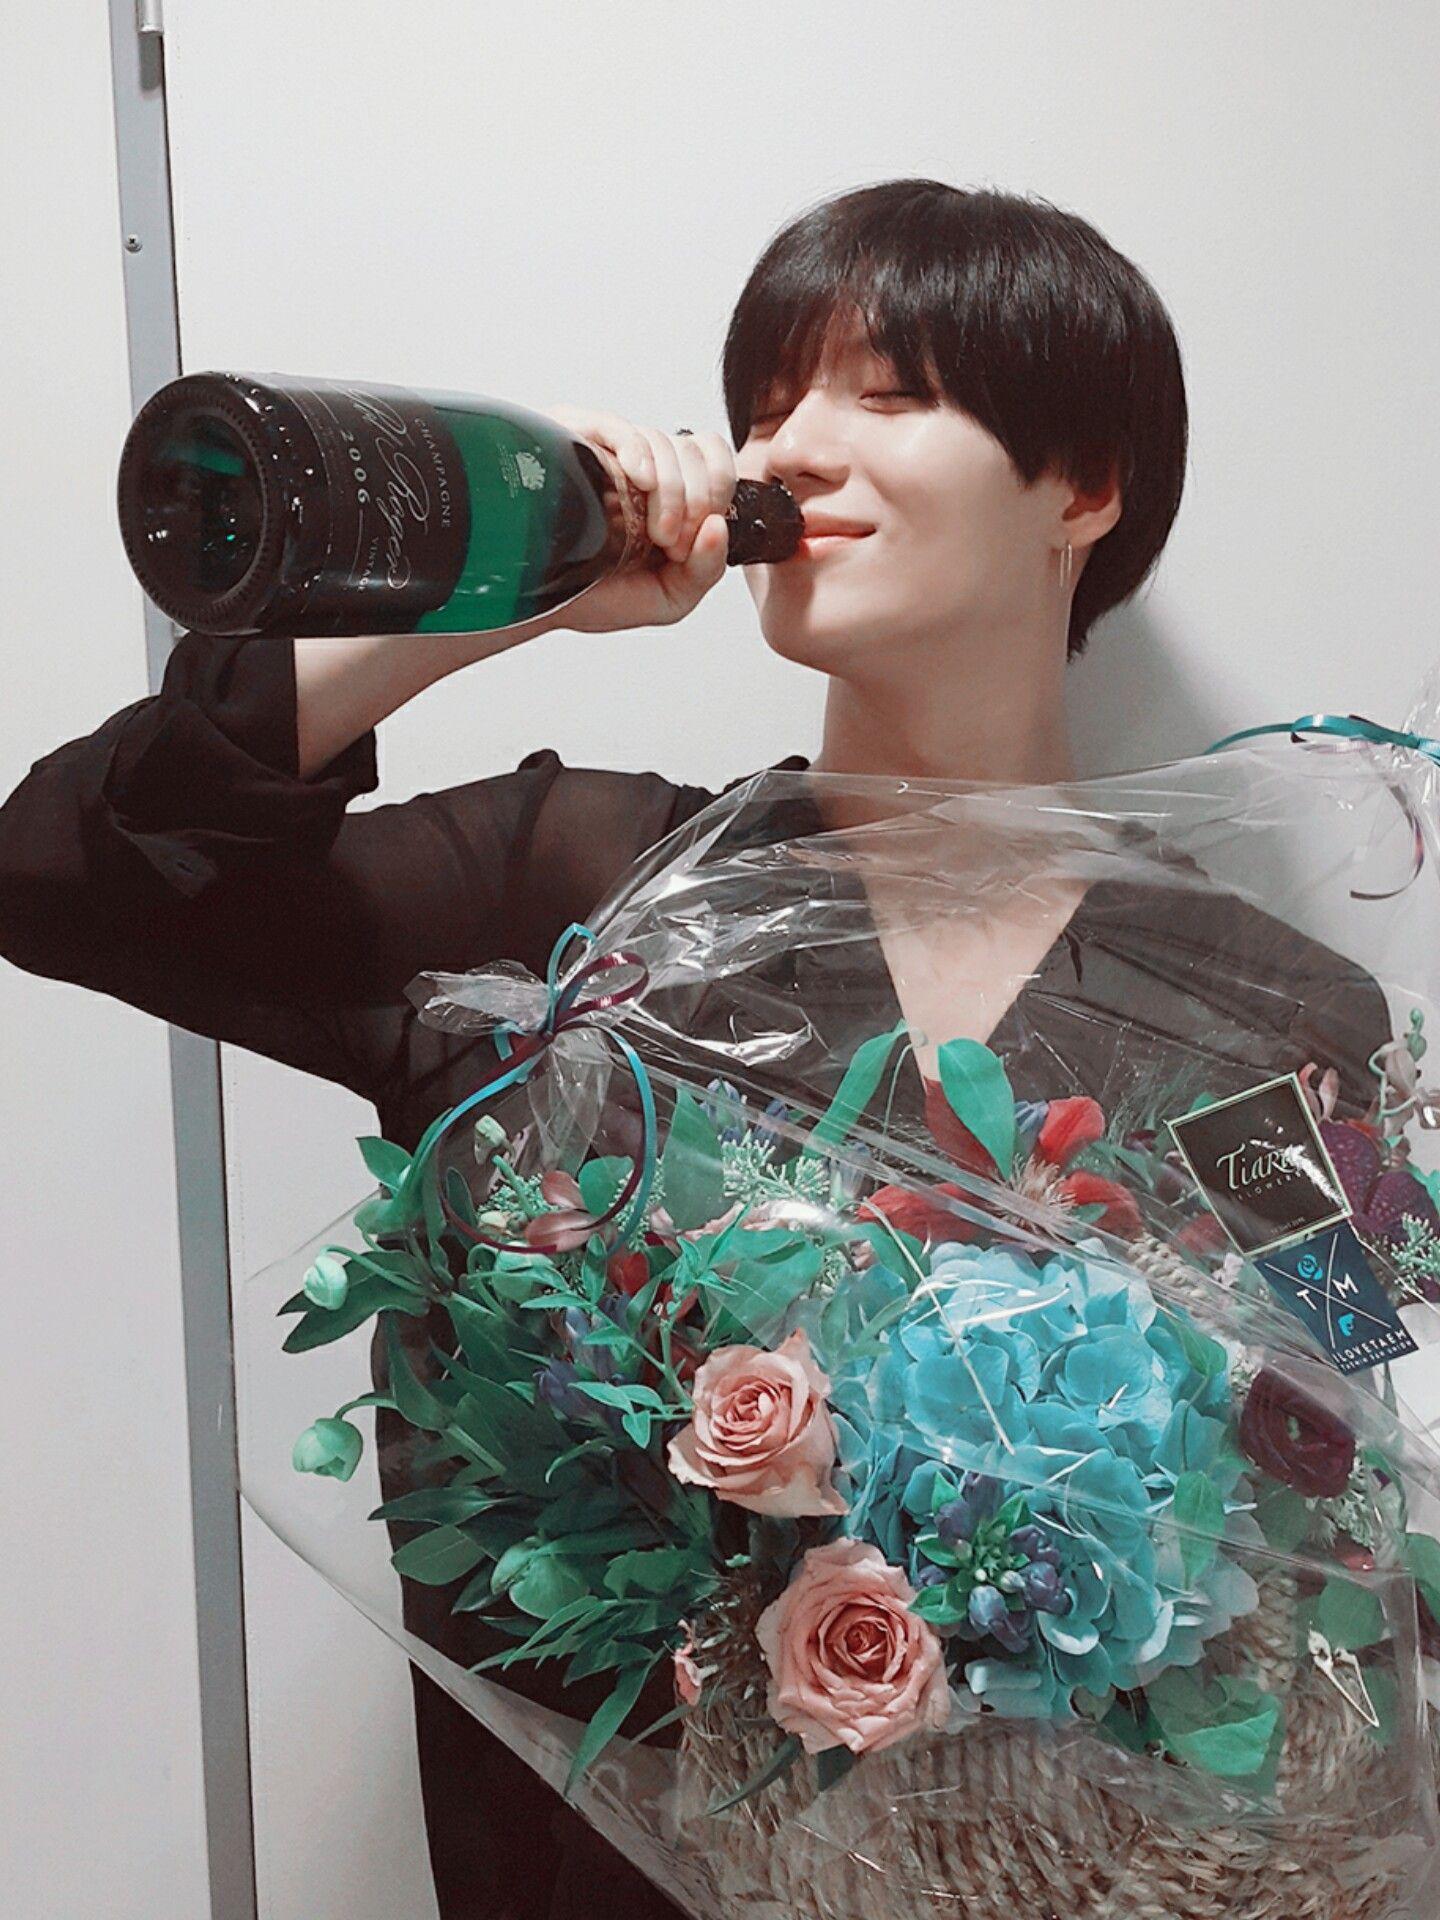 [Vyrl] SHINee : 넘나 아쉬워서 뽀너스 사진! #사요나라탬토리🙏 #셀카요뎡완댜님👑 #태민😆과 굿밤 보내세요~🌃 #News #샤이니 @SHINe